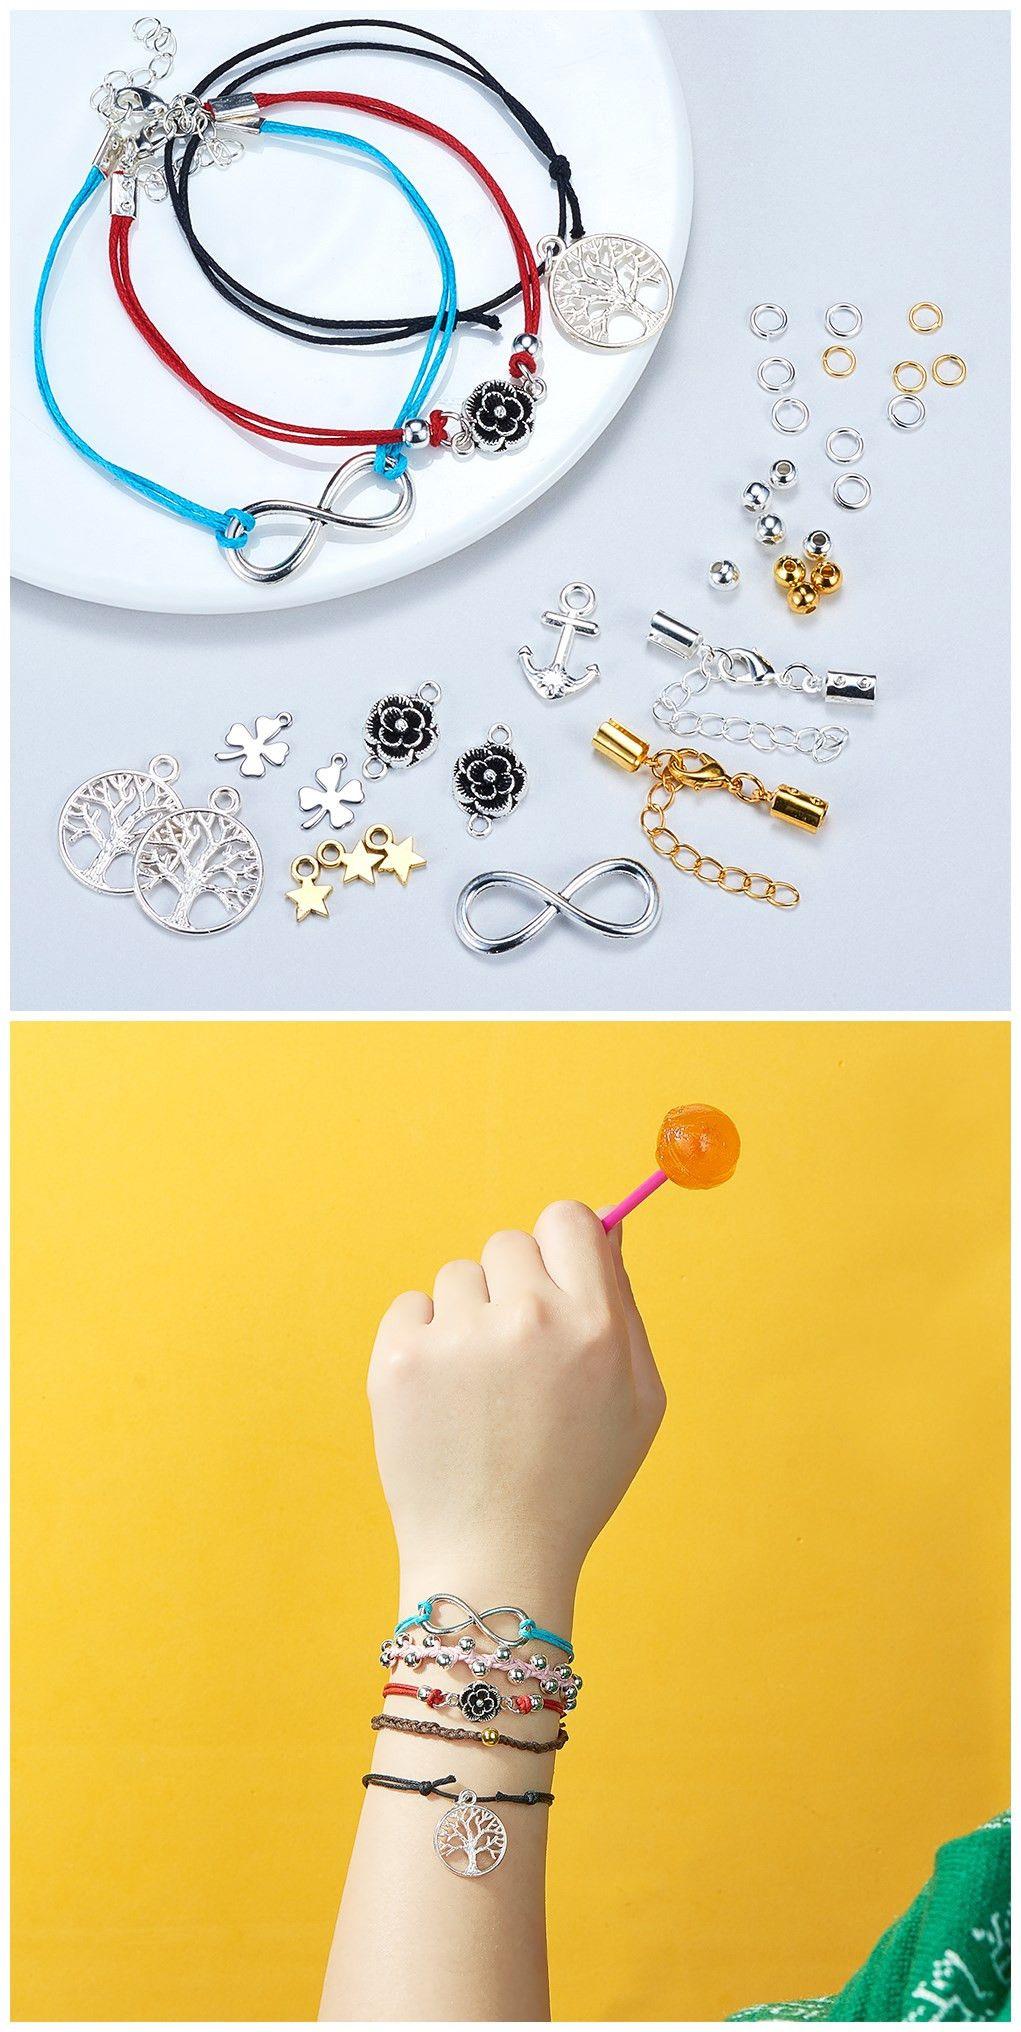 Sunnyclue set diy jewelry bracelet necklace making starter kit